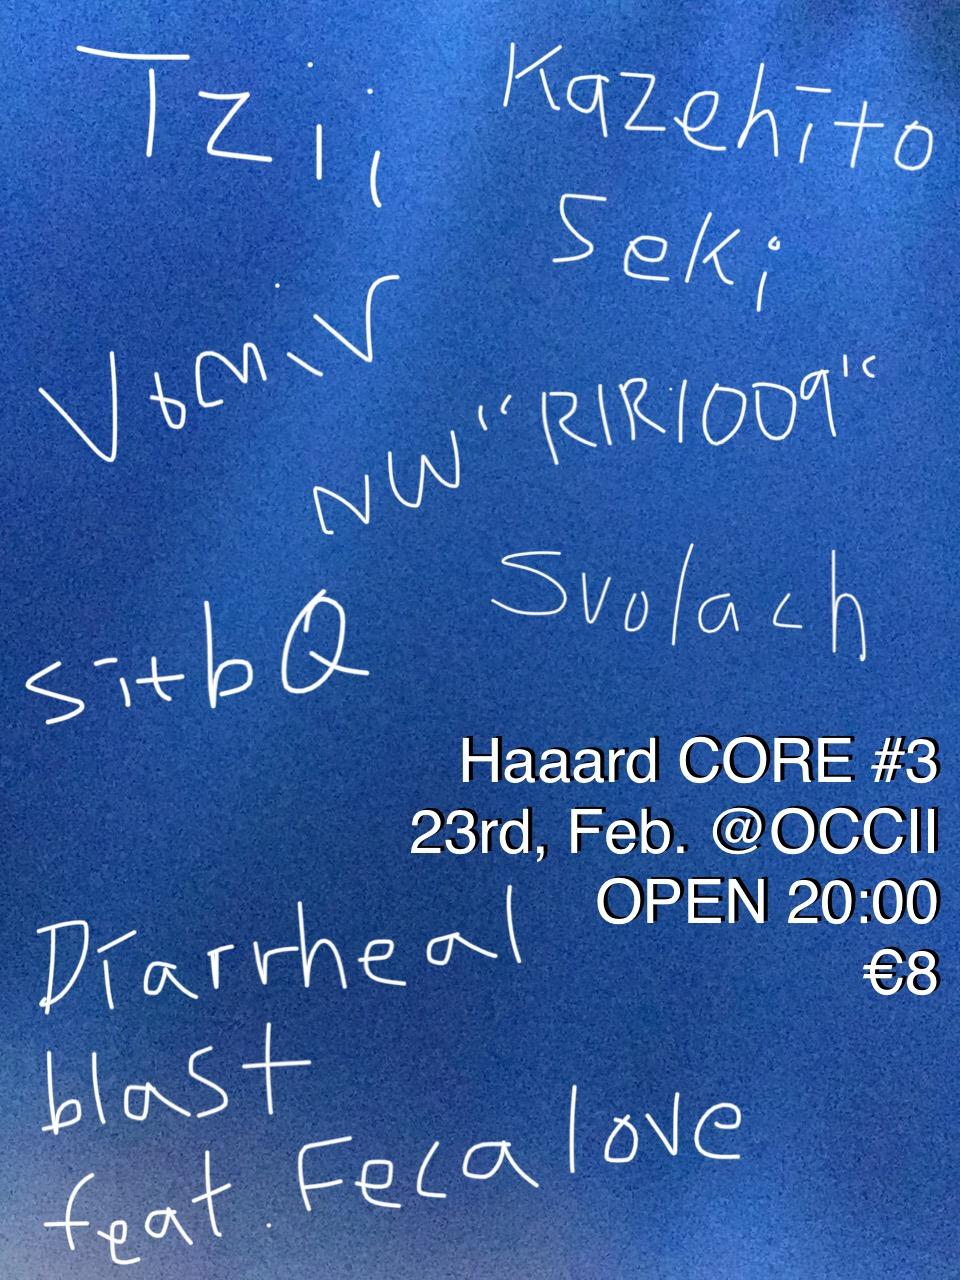 Diarrheal Blast ft. Fecalove + Kazehito Seki + NW »RIR1009» + sitbQ + Tzii + Vomir + Svolach